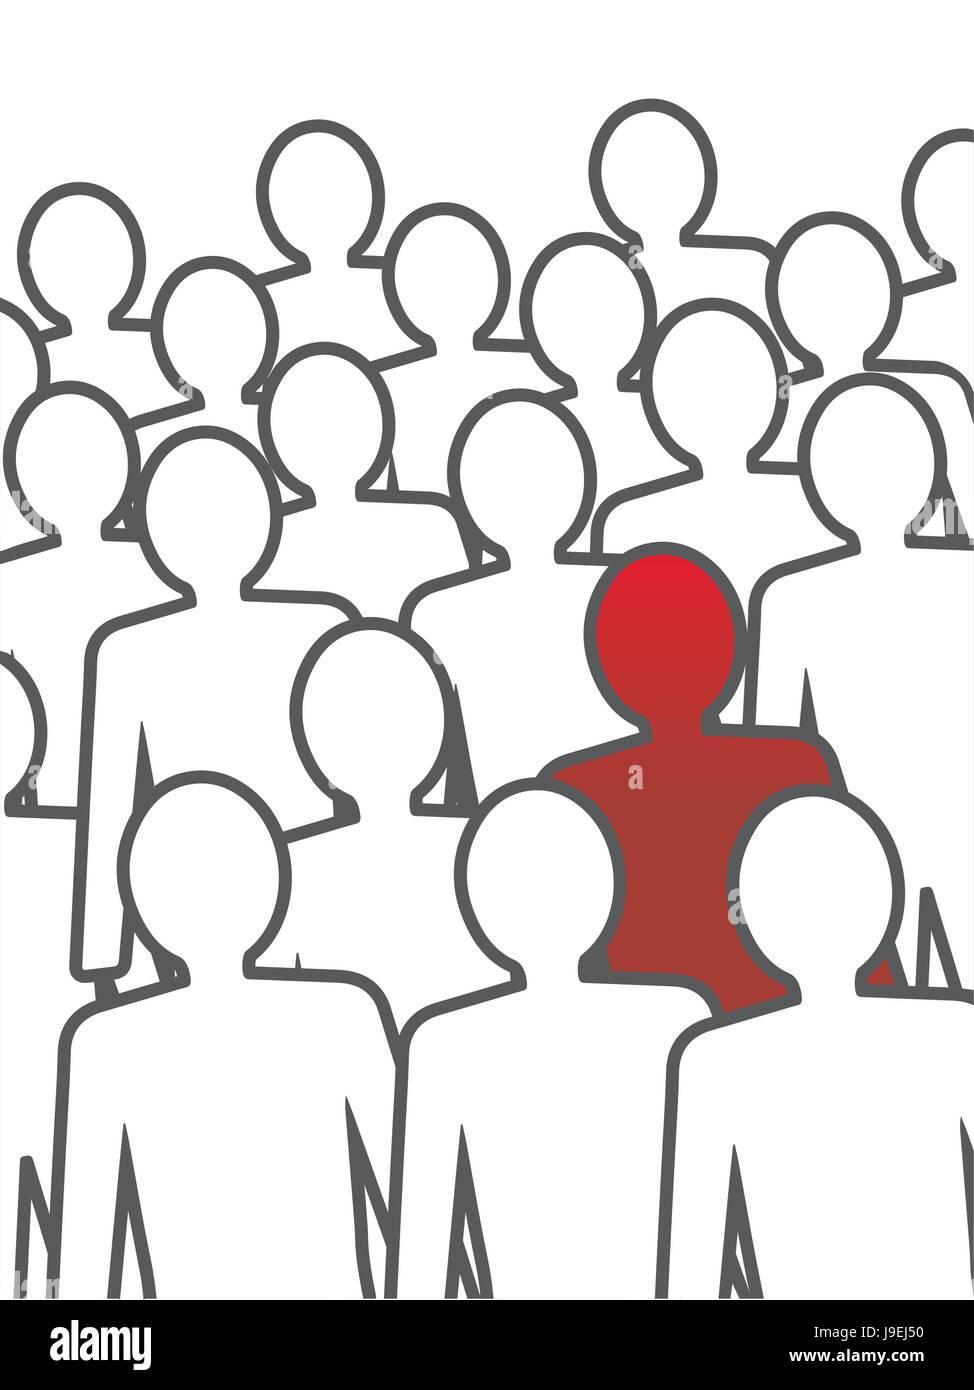 Unusual person in the crowd. Vector concept illustration. - Stock Vector